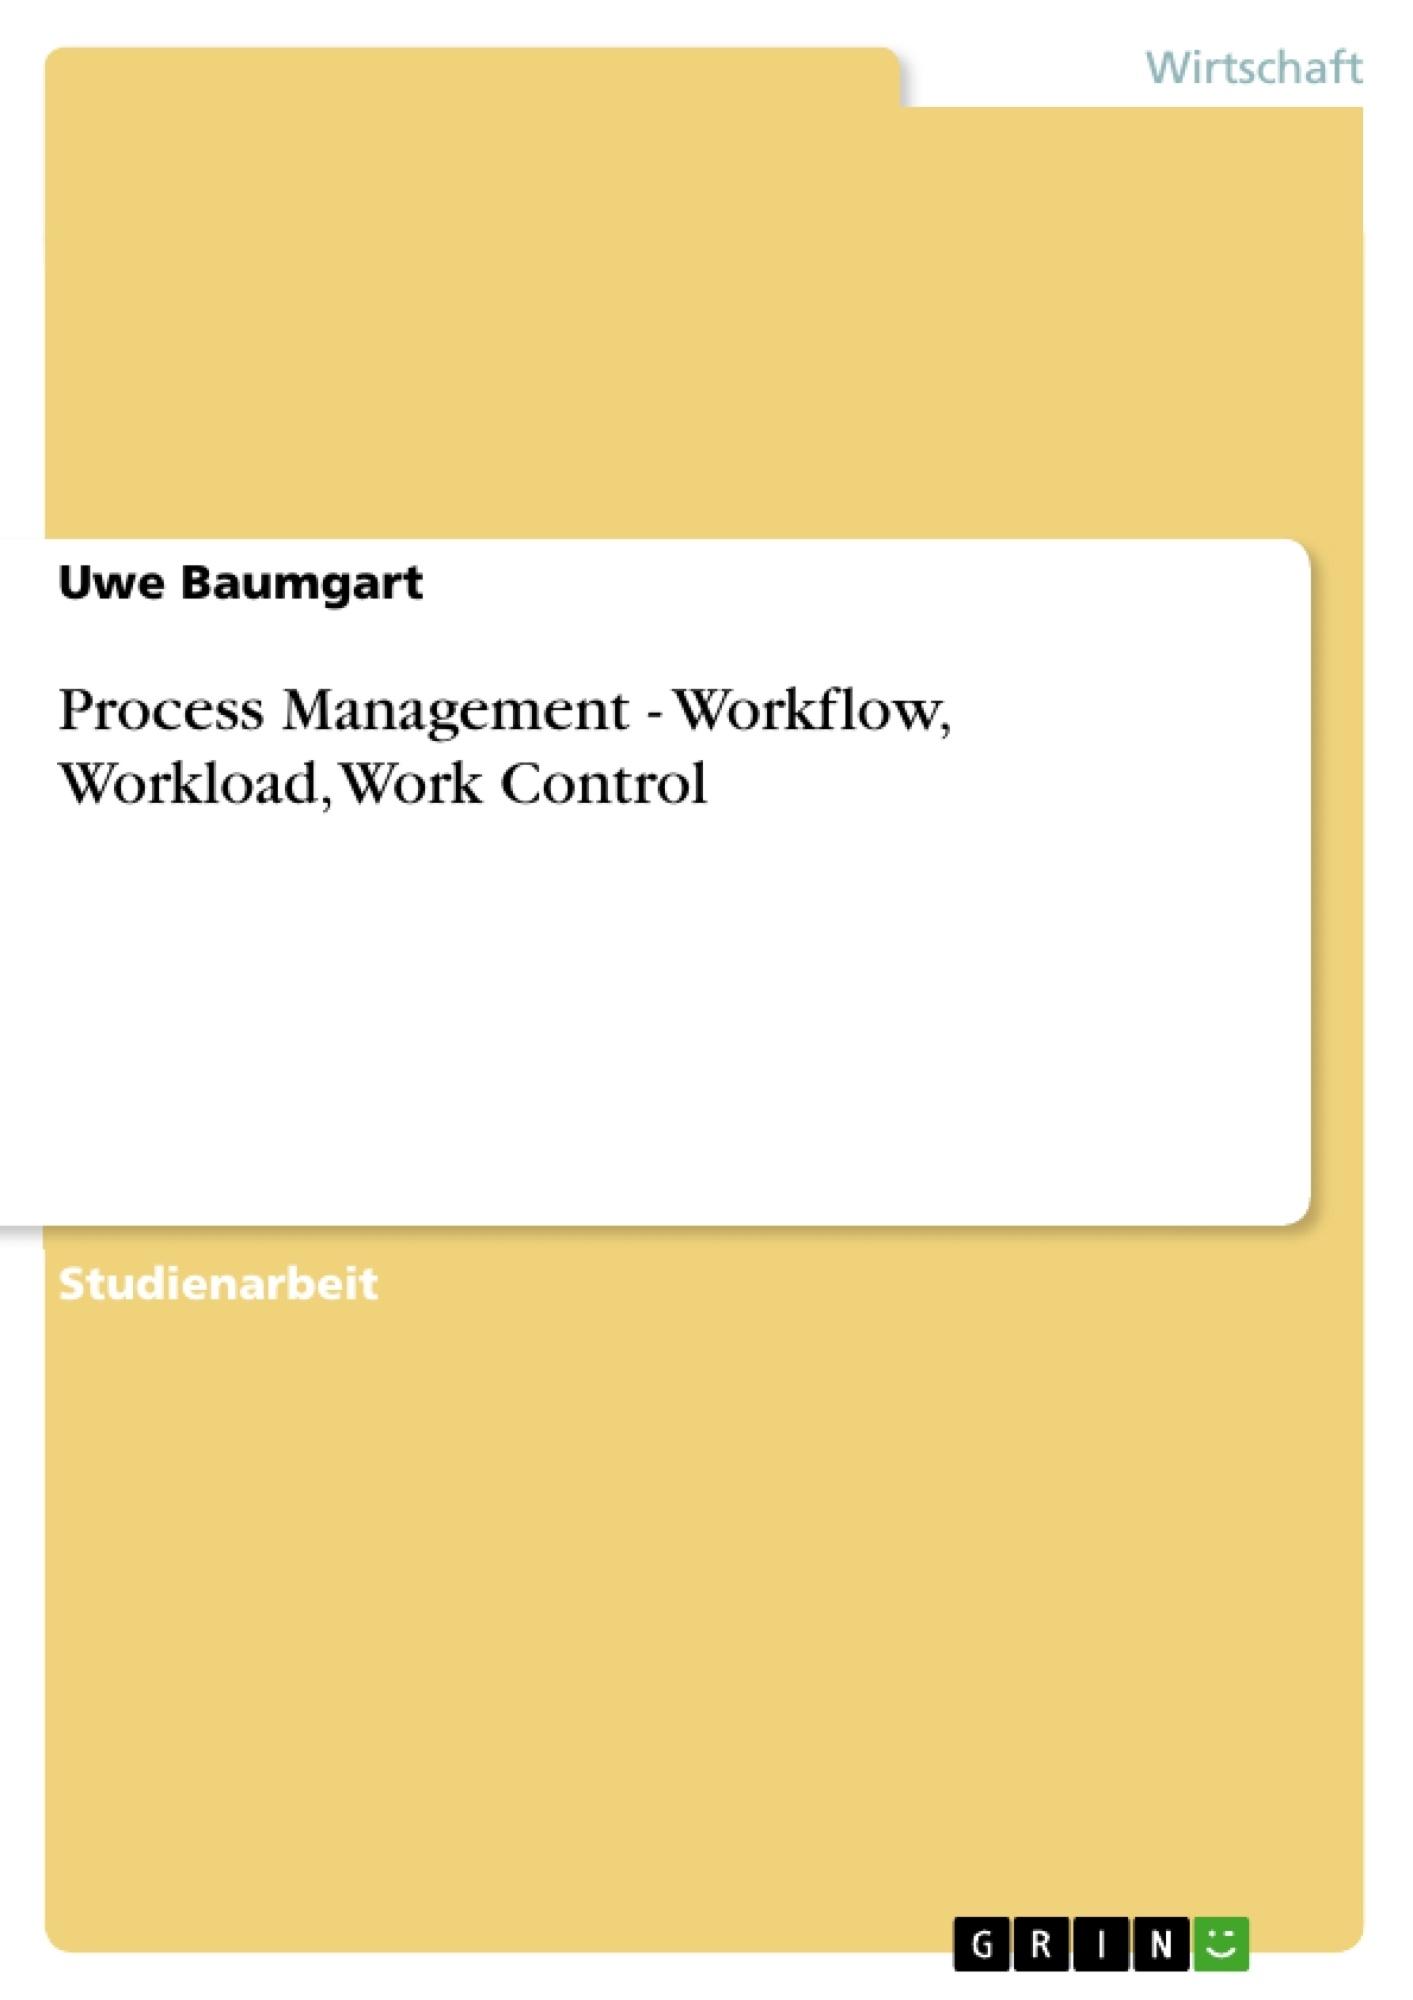 Titel: Process Management - Workflow, Workload, Work Control